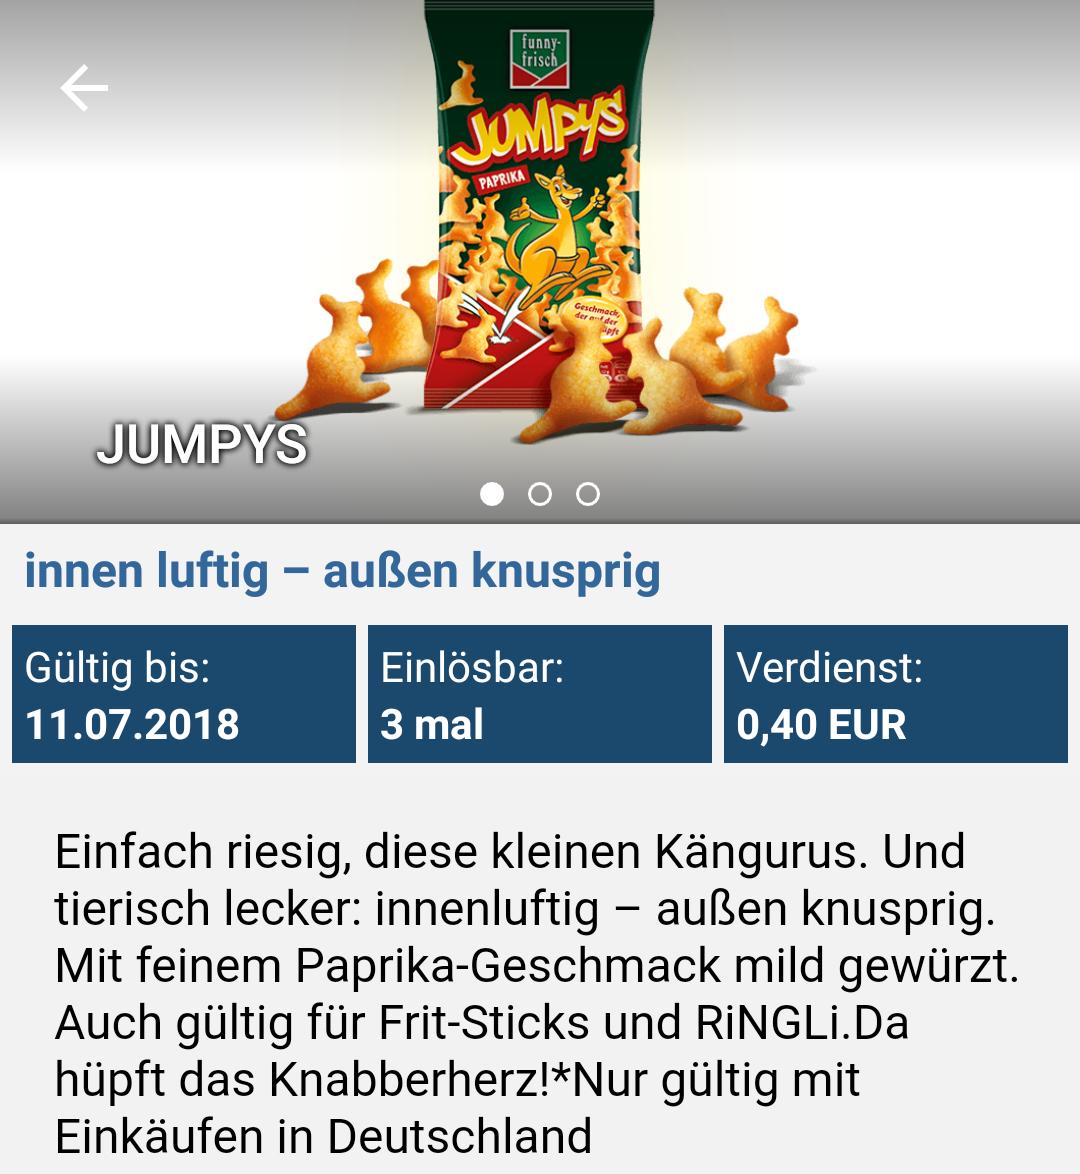 [Reebate App] 3x 0,40€ Rabatt auf Funny Frisch Jumpys